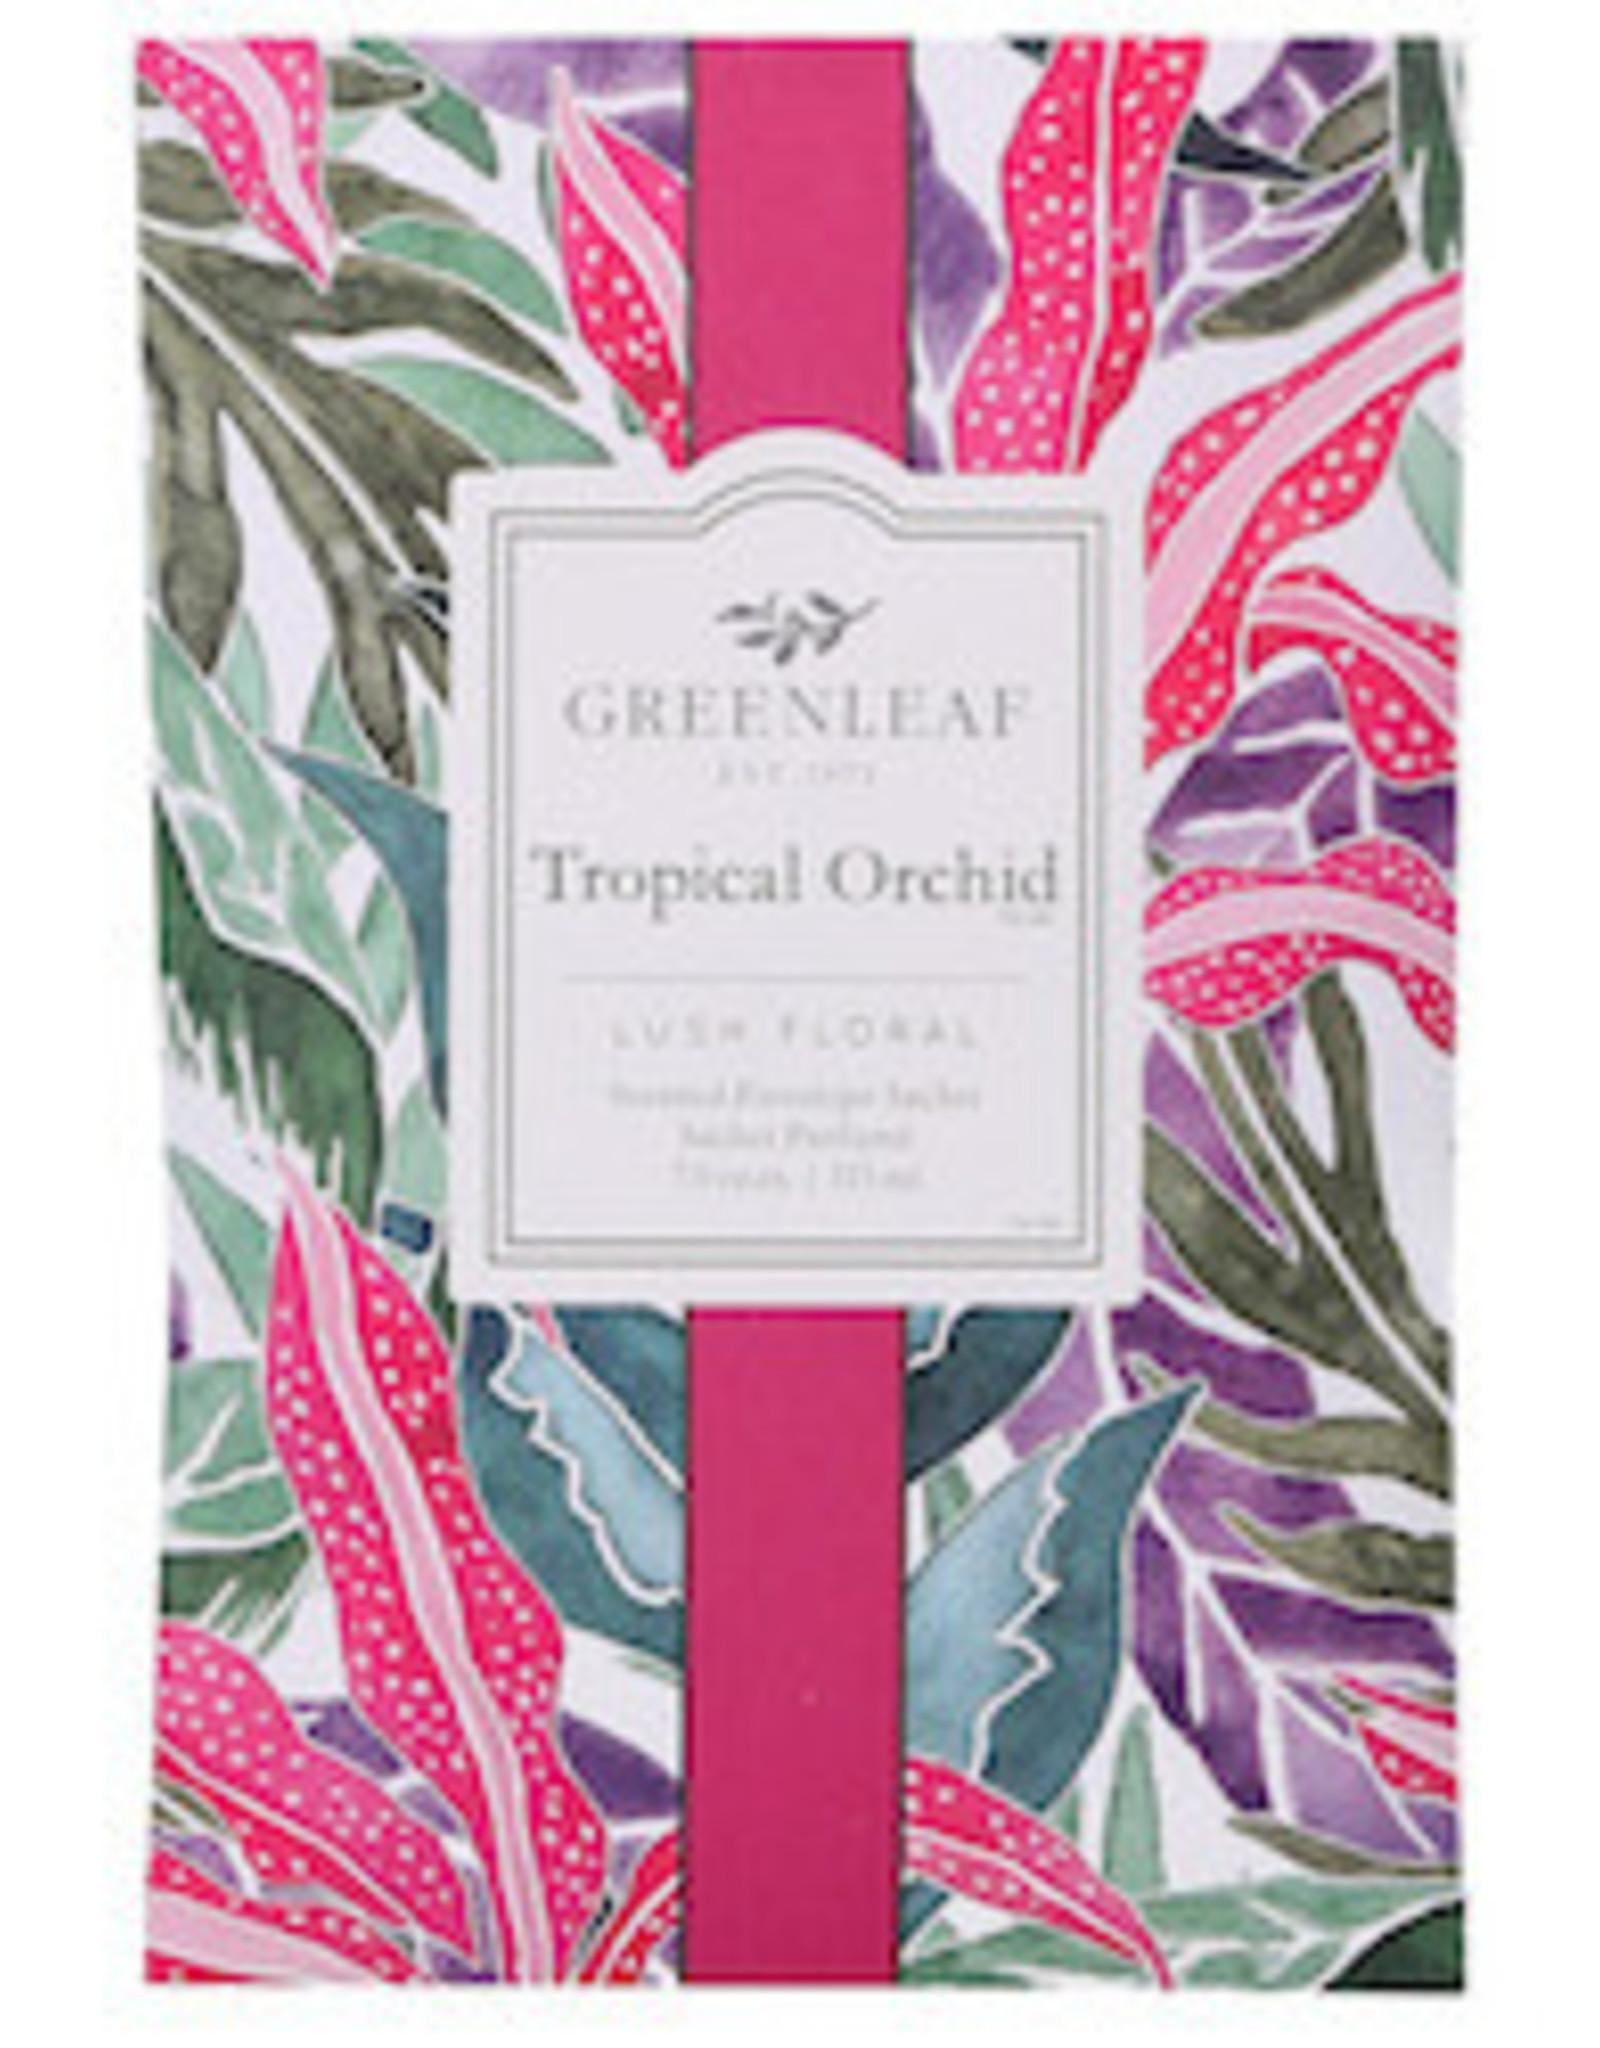 GreenLeaf Tropical Orchid Geurzakje groot - GreenLeaf